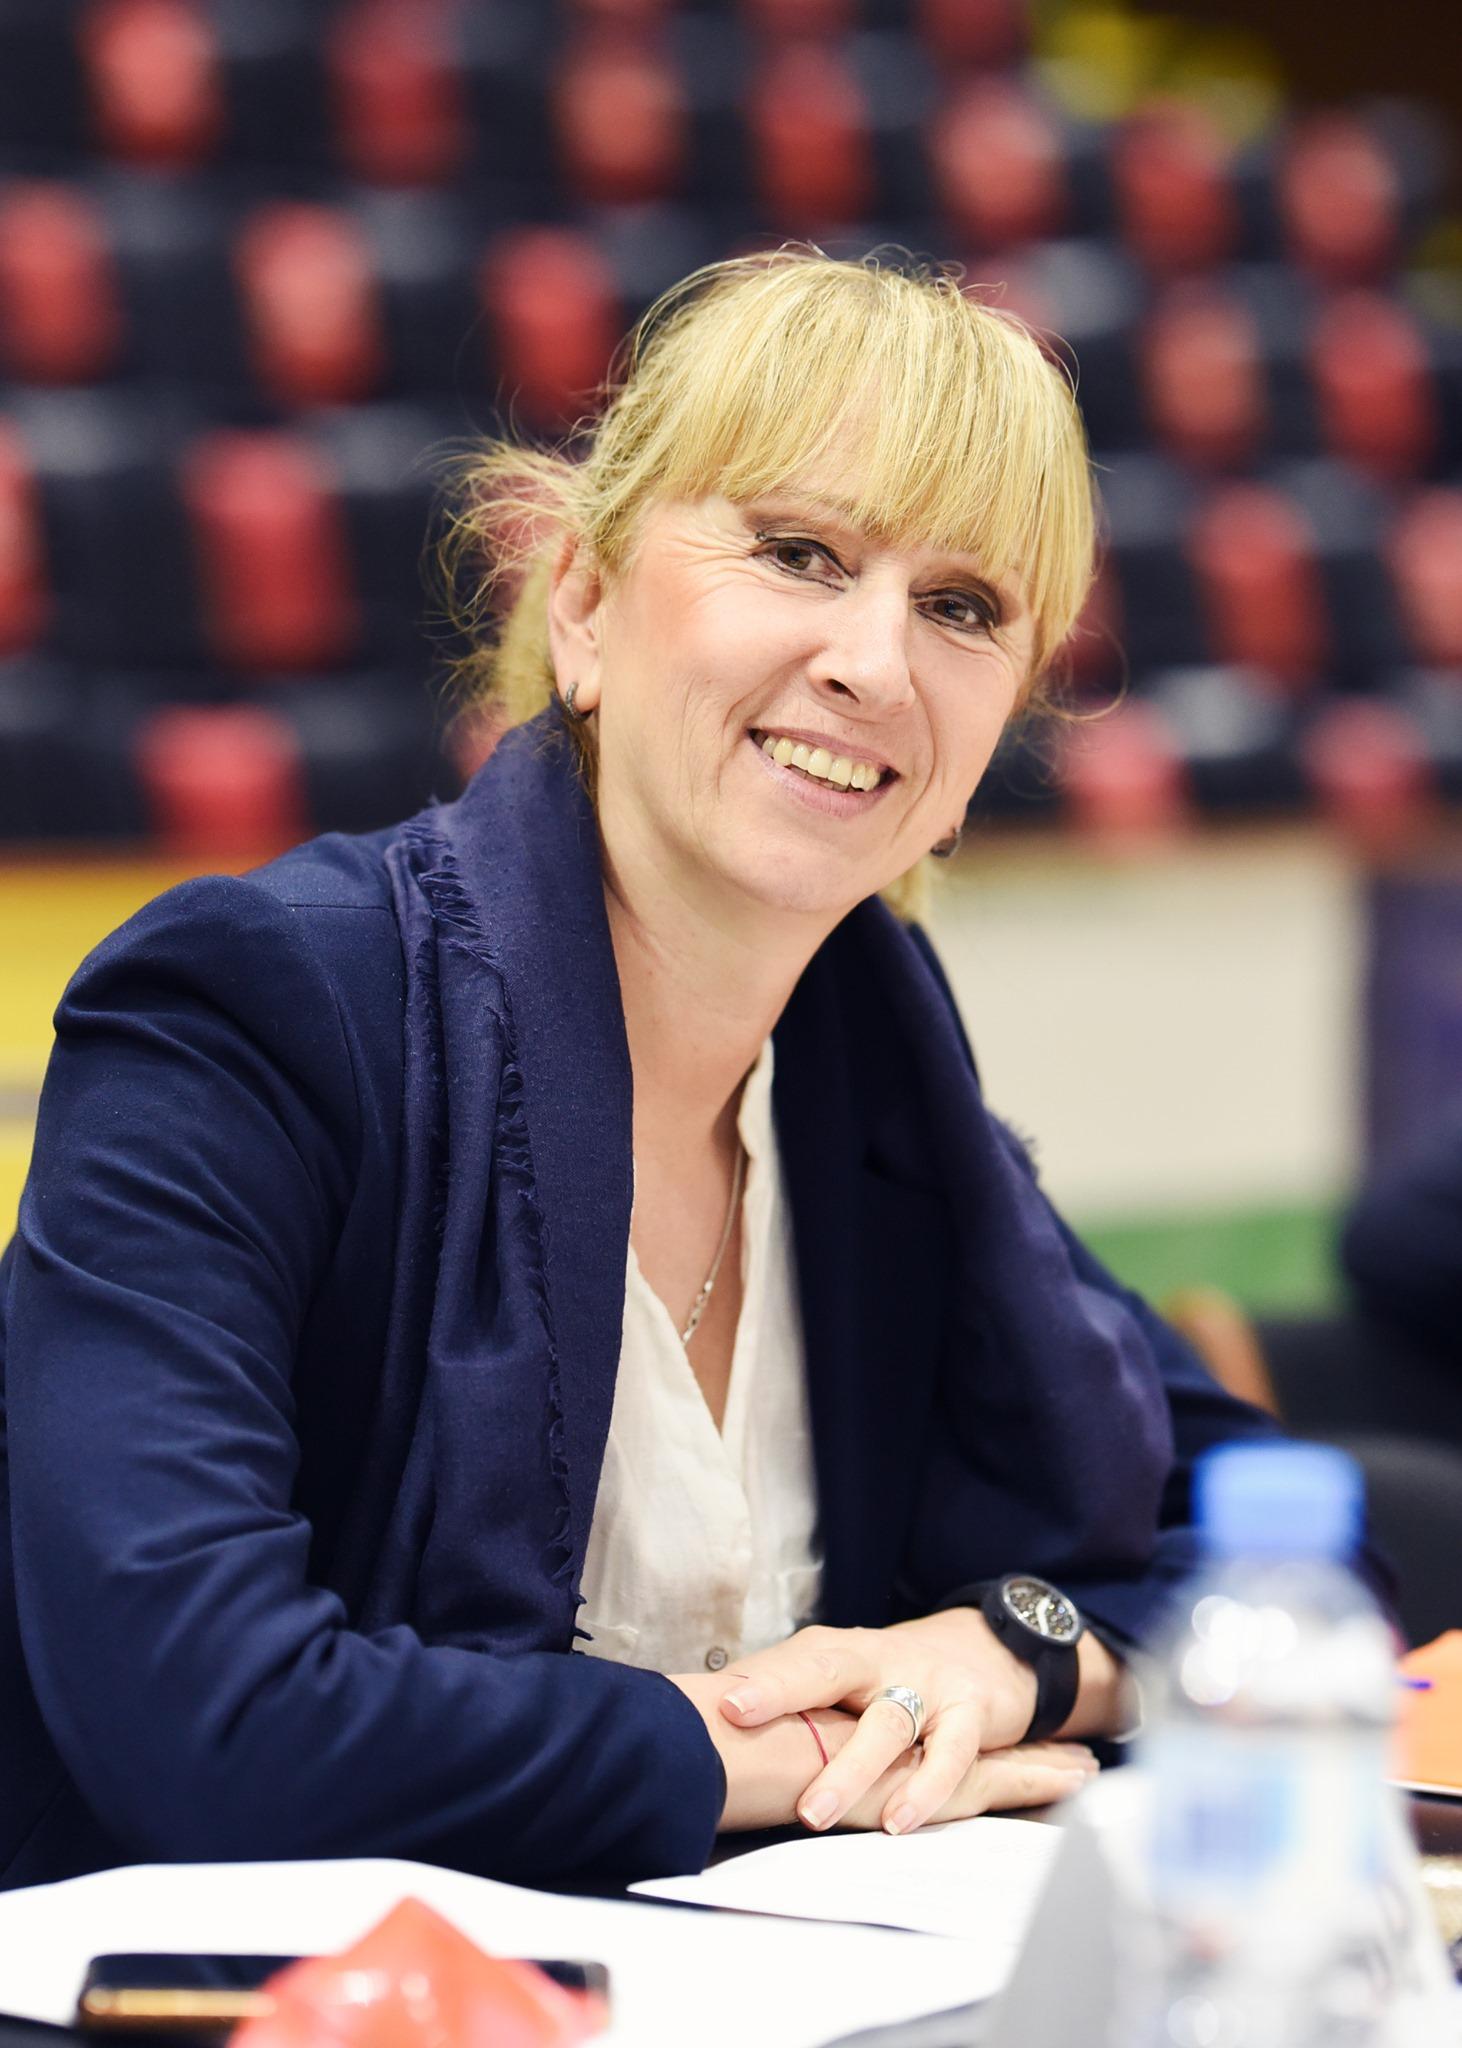 Irina Cherneva